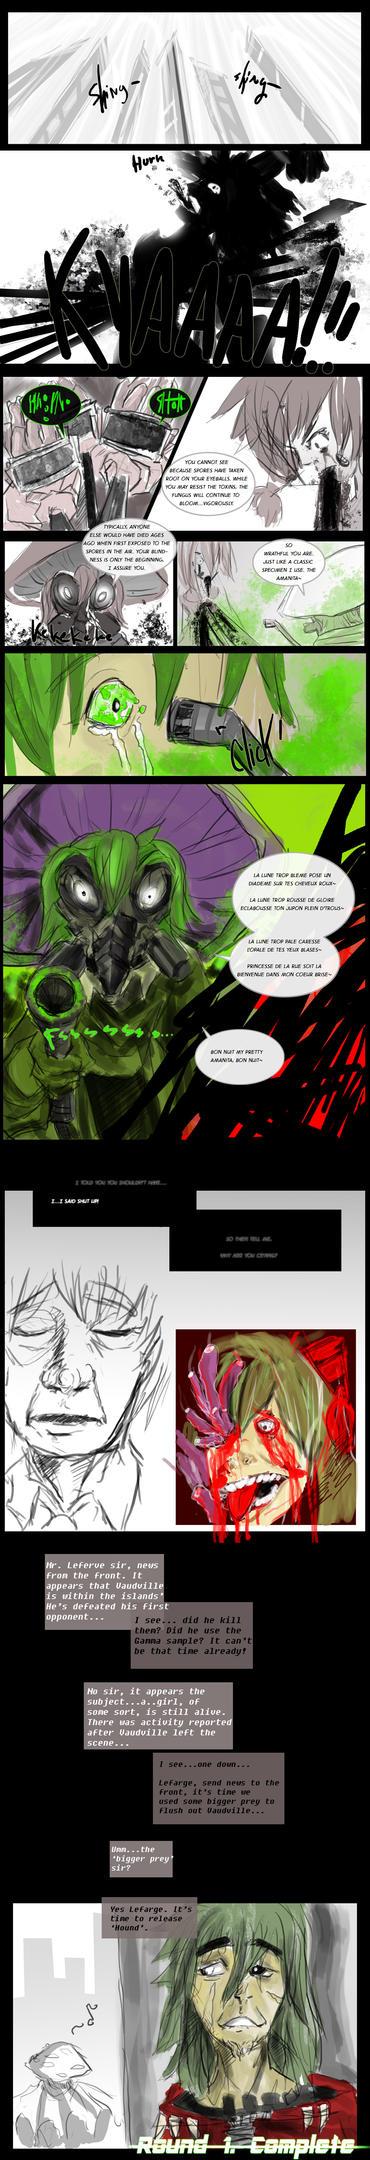 Deadline Rnd 1--Part 2 by Queen-and-Azriel